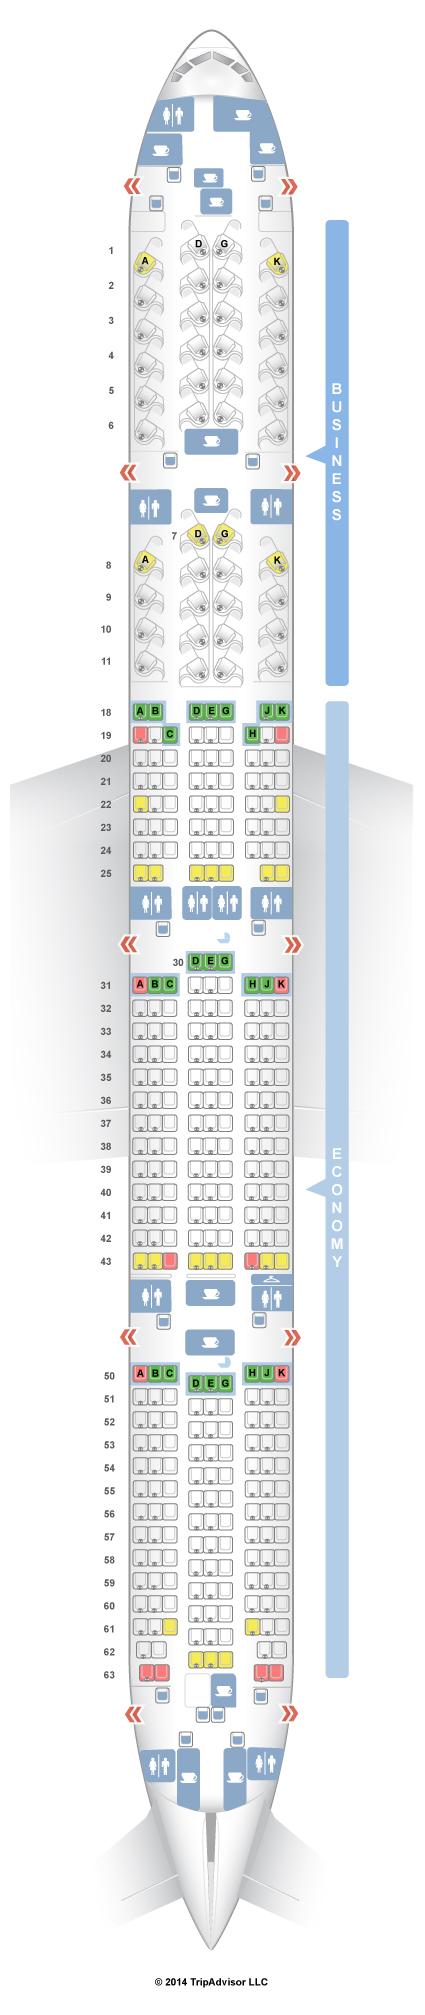 Air Canada 777 300 Seat Map SeatGuru Seat Map Air Canada